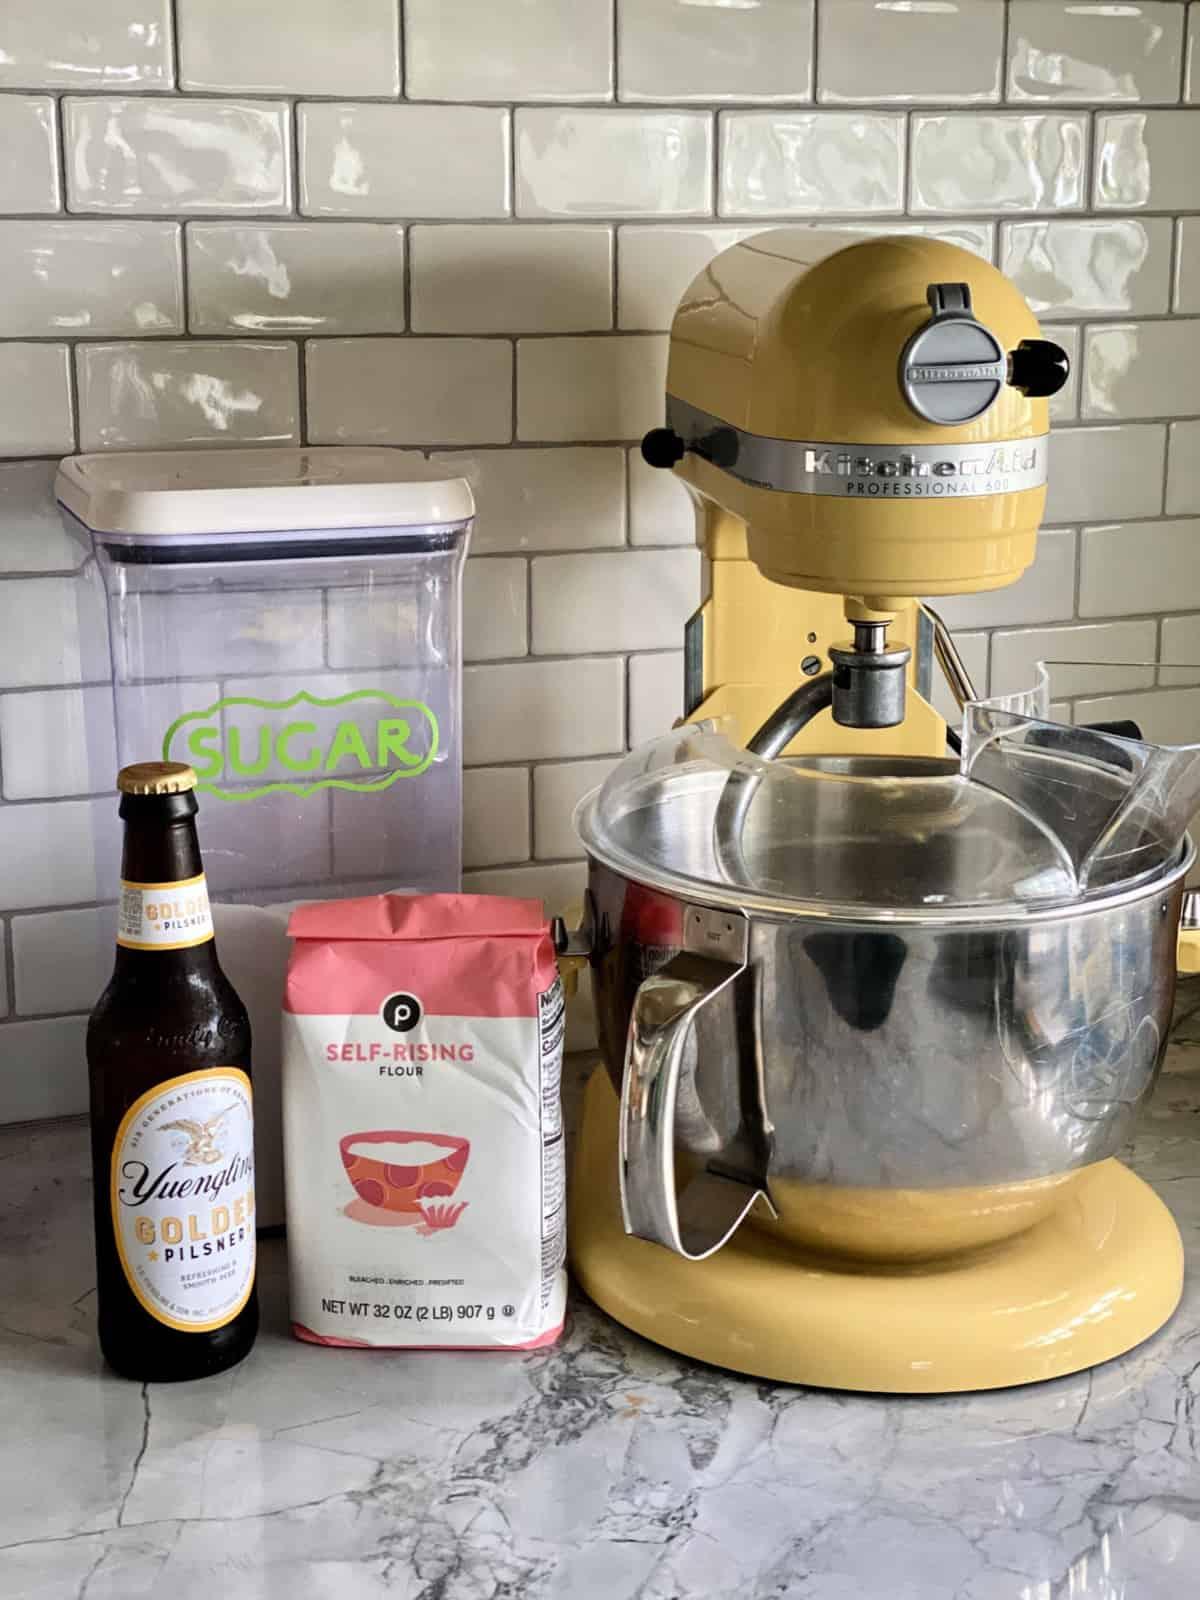 Yuengling Pilsner, self-rising Flour, and sugar on countertop next to yellow KitchenAid Professional 600 mixer.